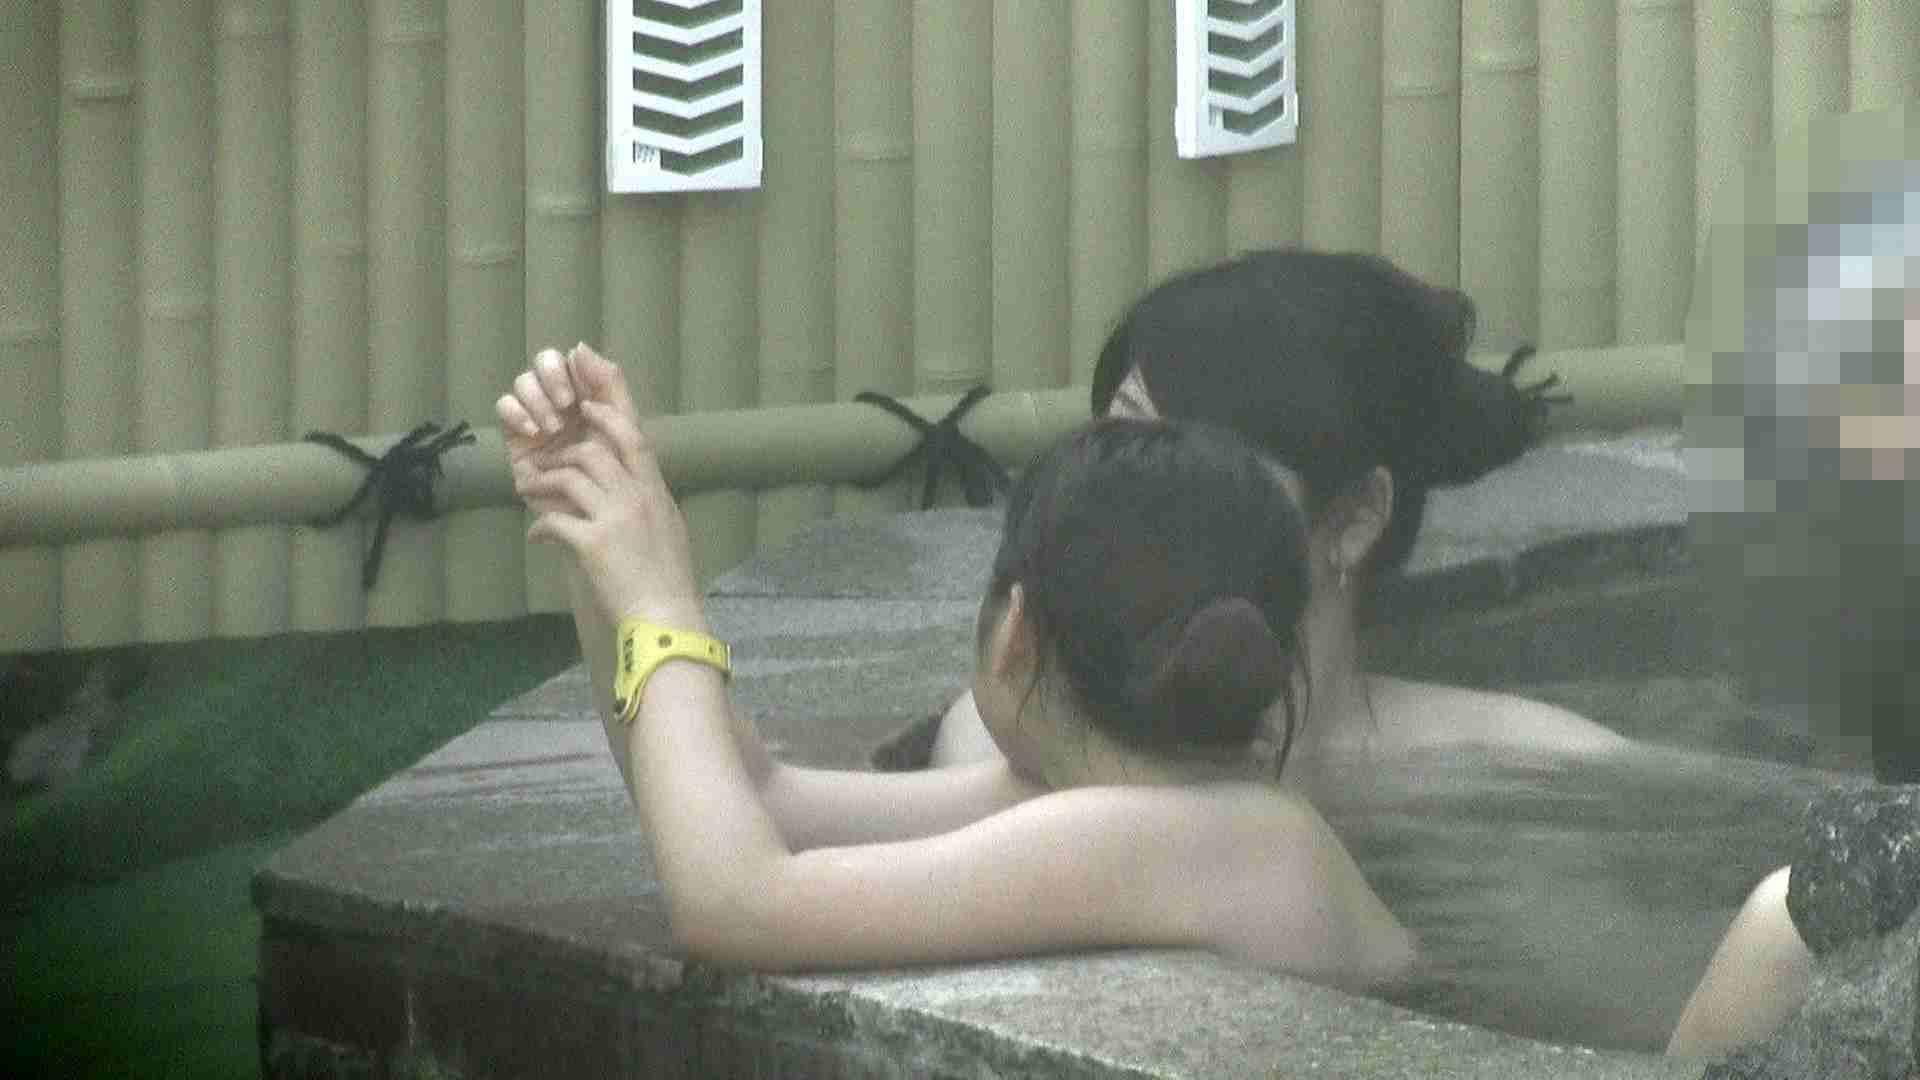 Aquaな露天風呂Vol.206 盗撮シリーズ | 露天風呂編  80PIX 43